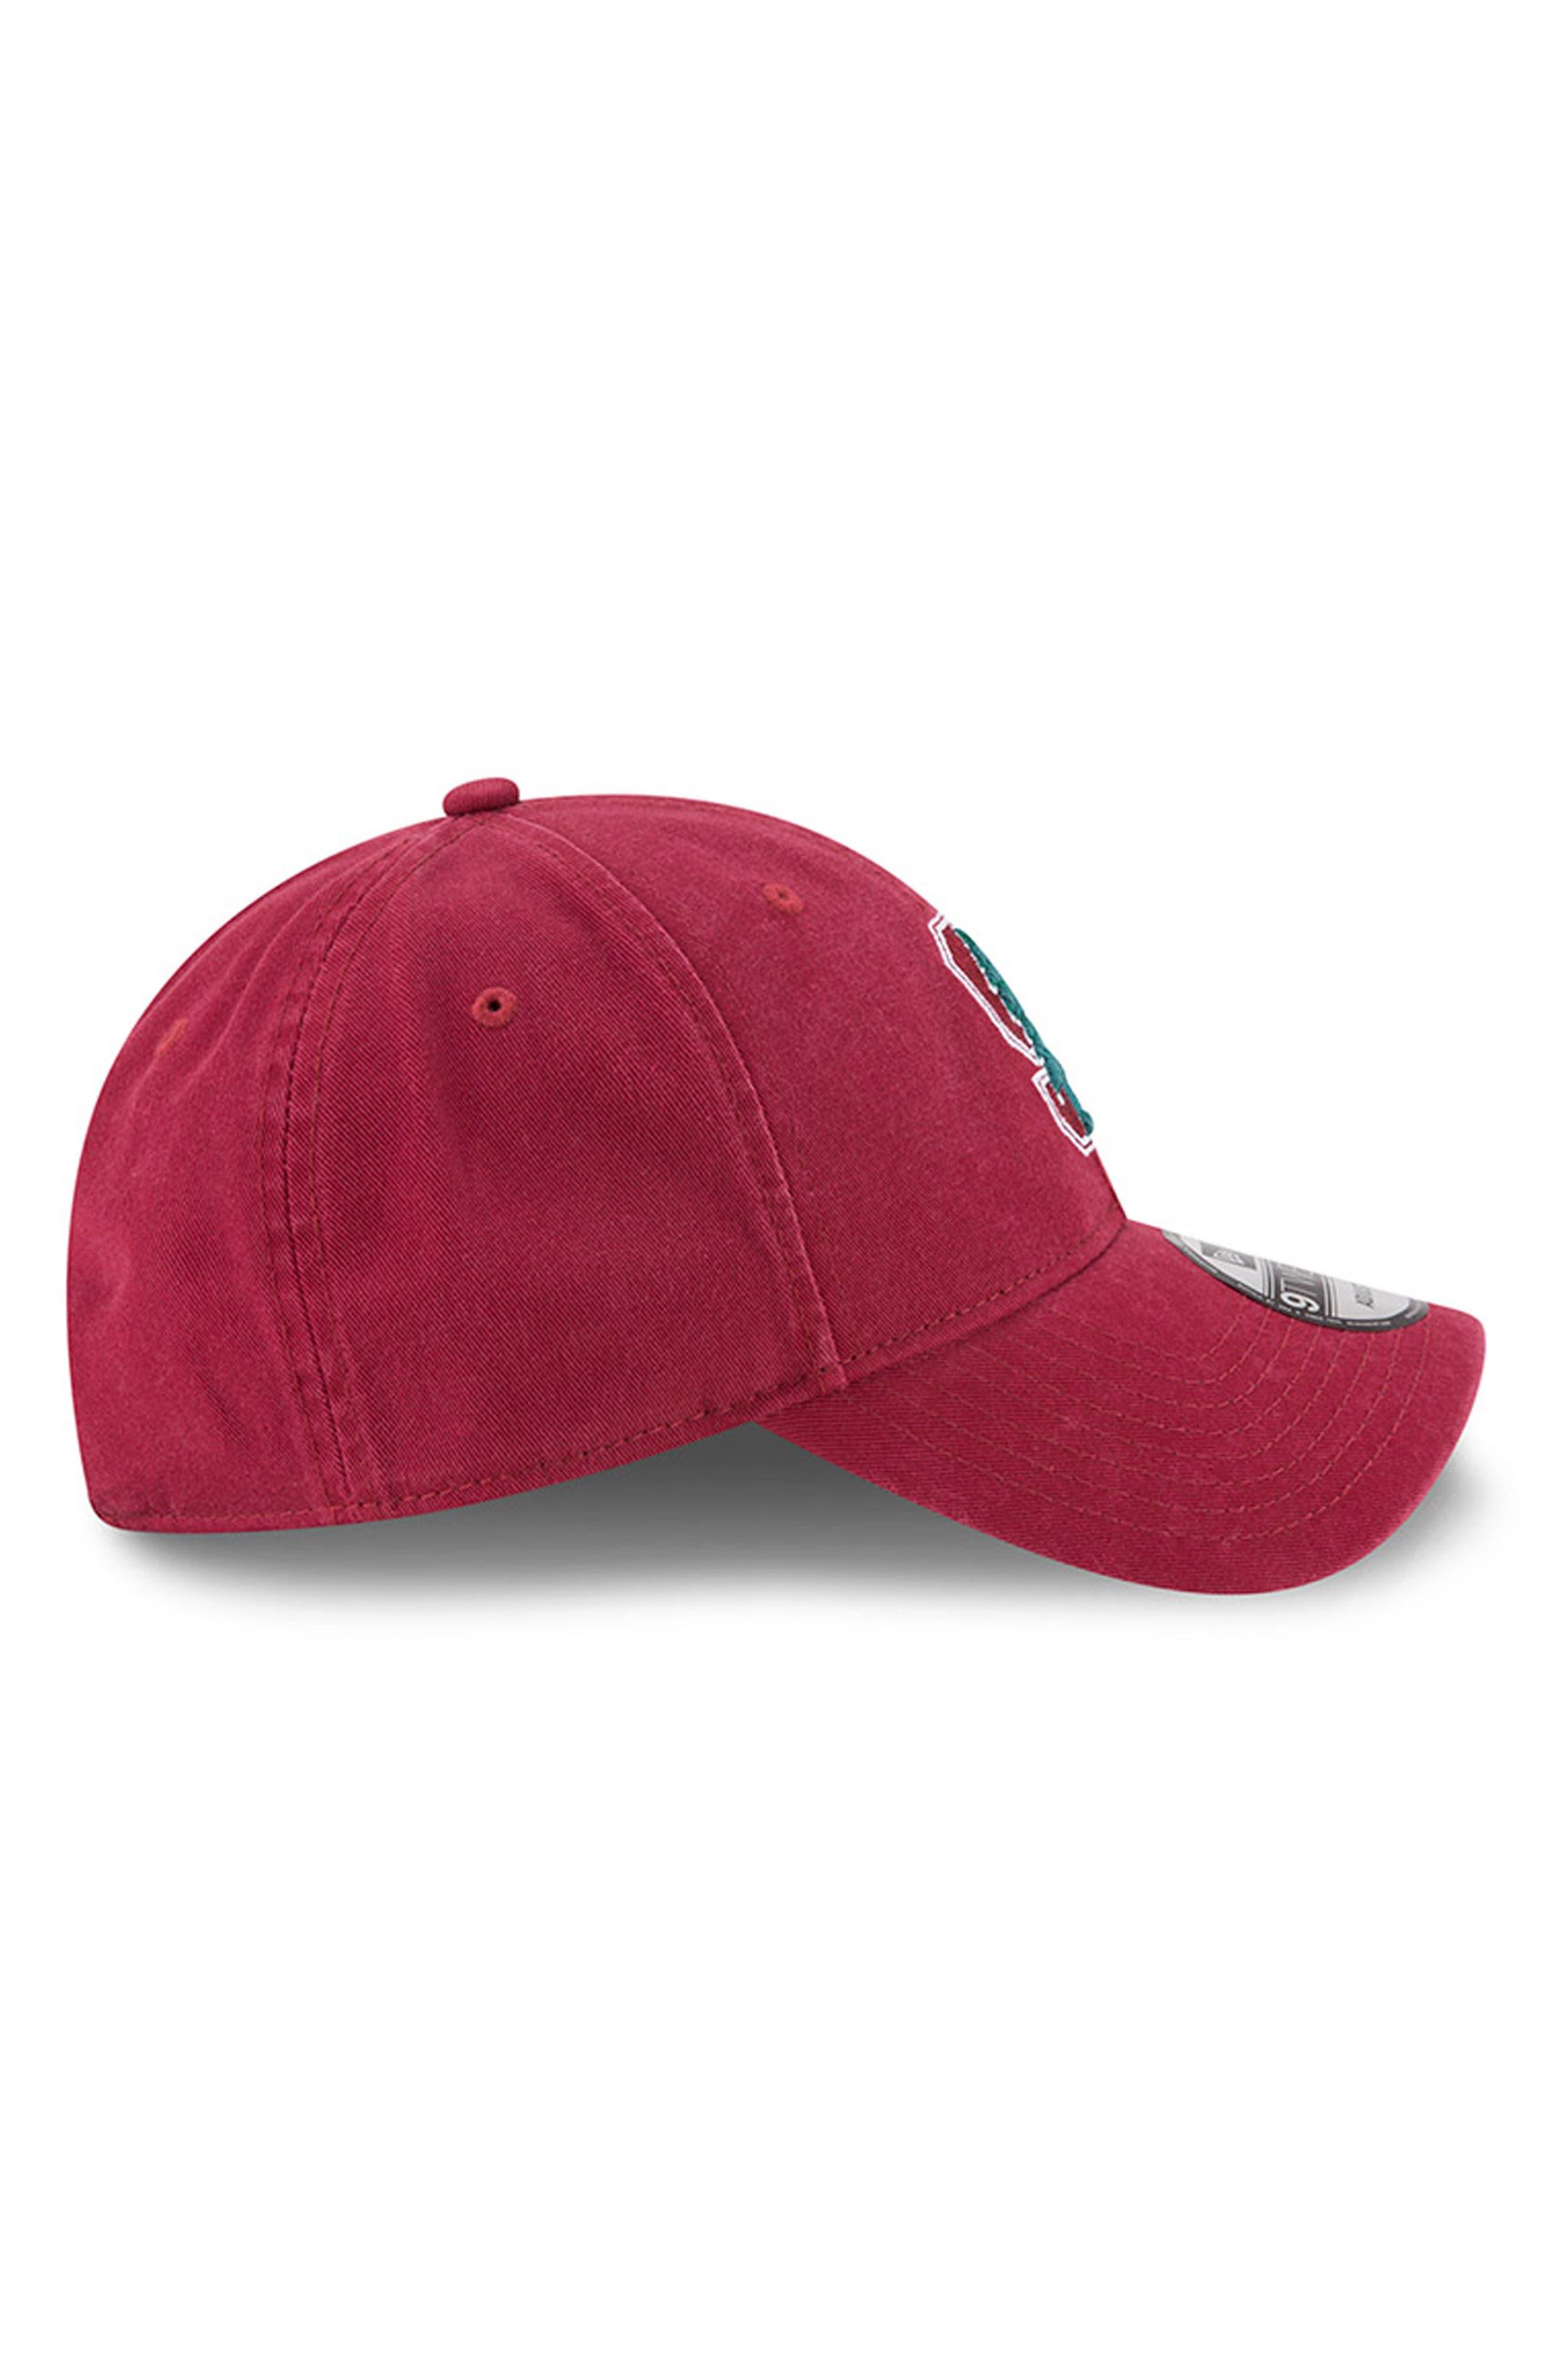 New Era Collegiate Core Classic - Stanford Cardinal Baseball Cap,                             Alternate thumbnail 3, color,                             Stanford Cardinal